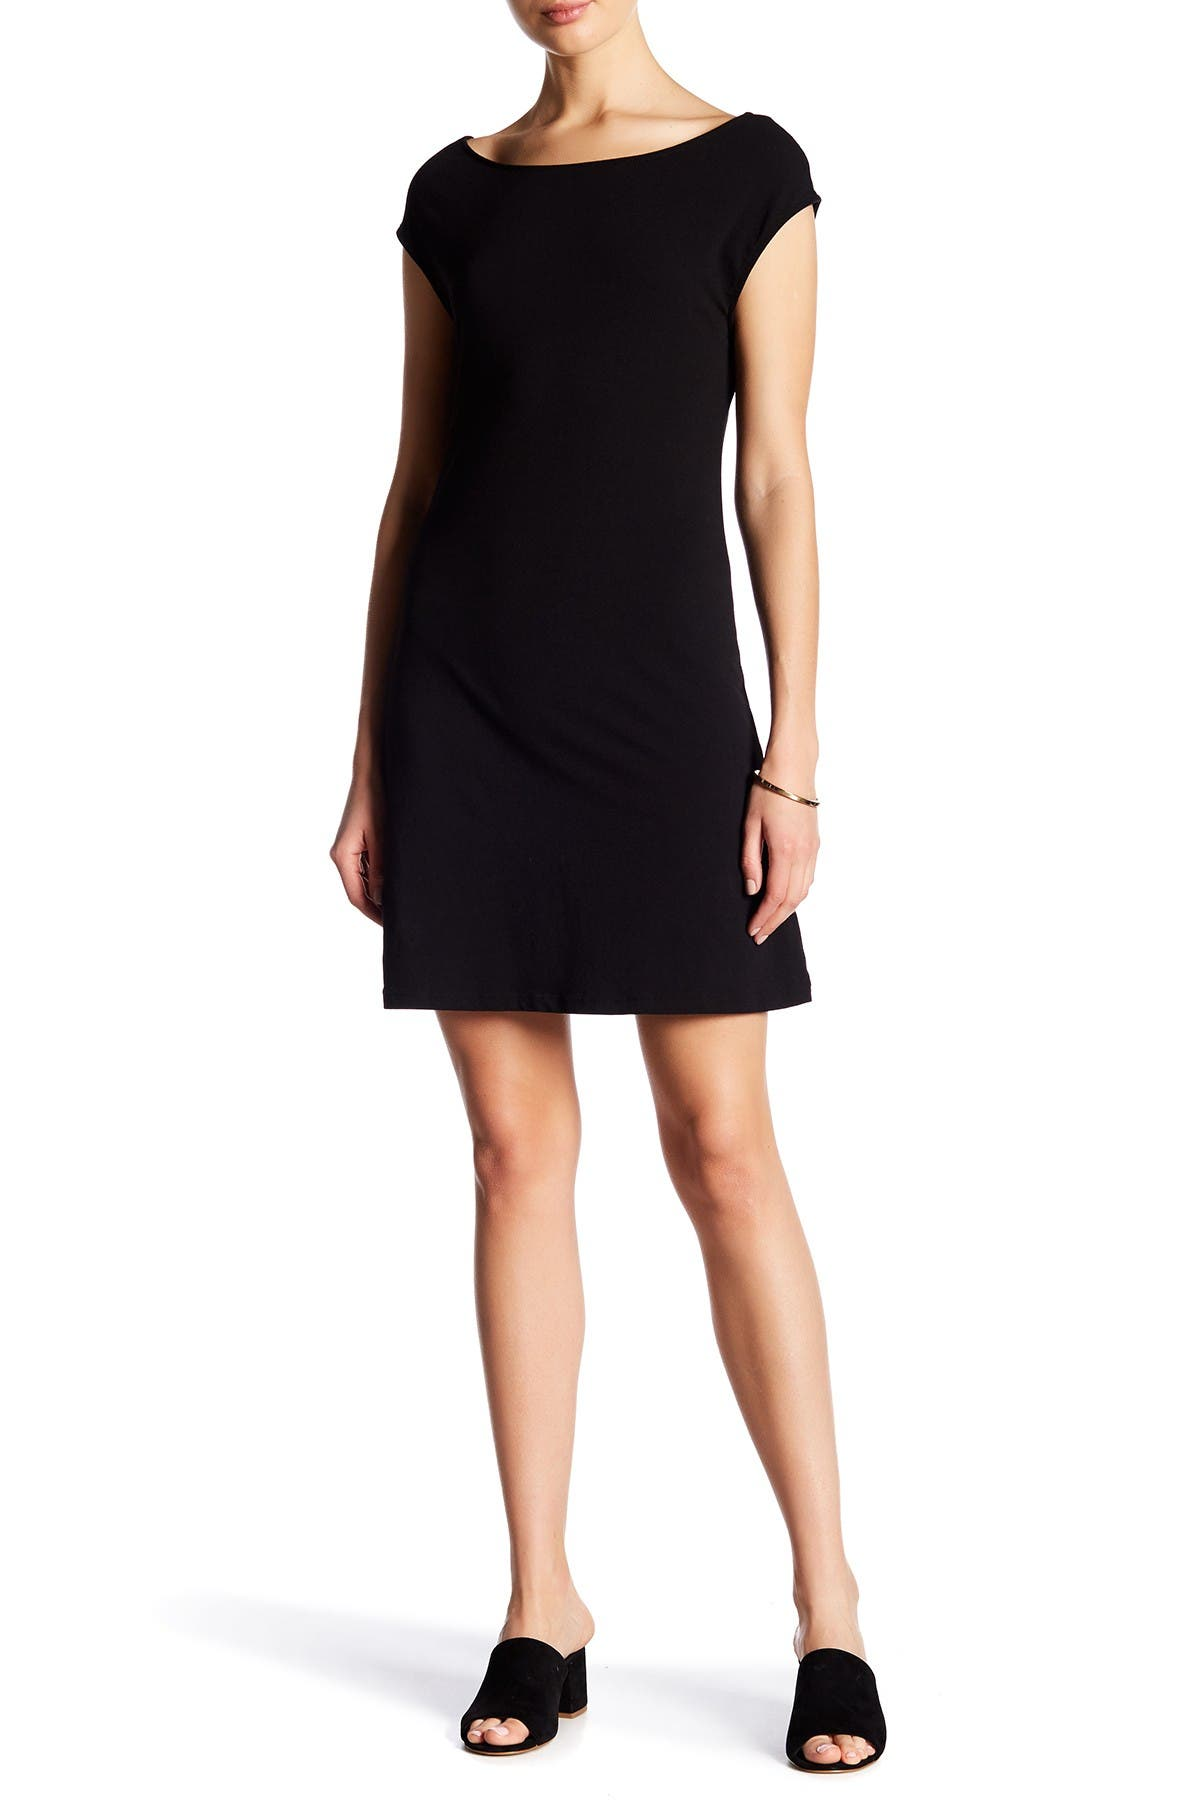 Image of James Perse Cap Sleeve Dress